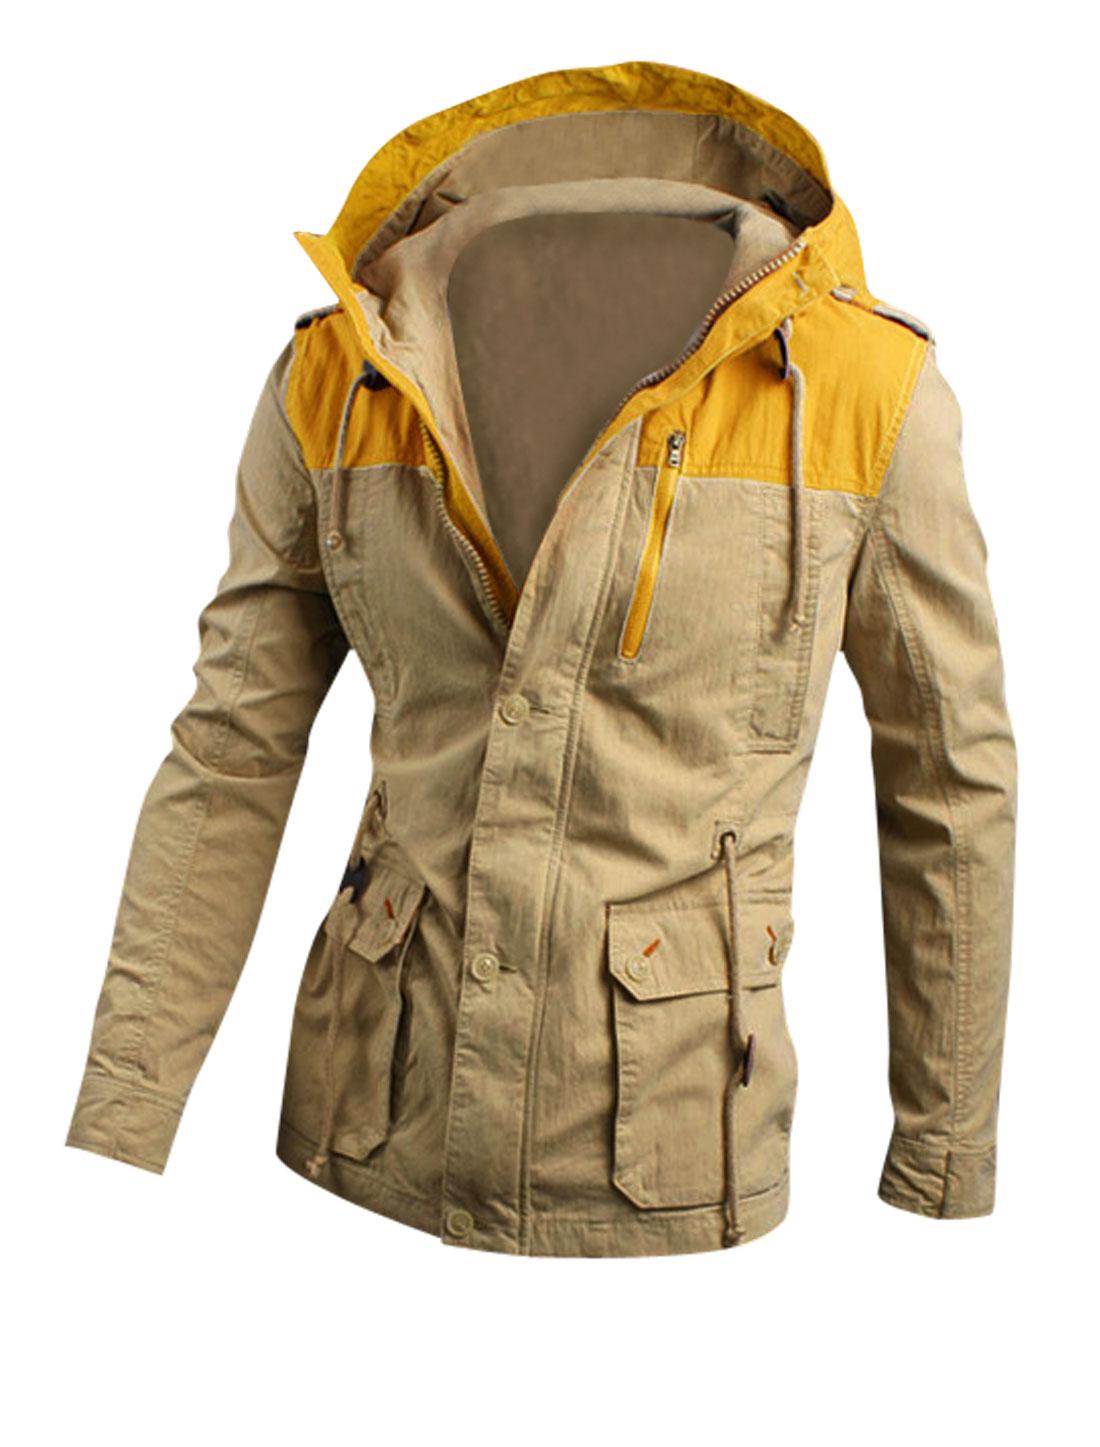 Men Drawstring Detail Multi Pockets Color Block Hooded Jacket Khaki Yellow M